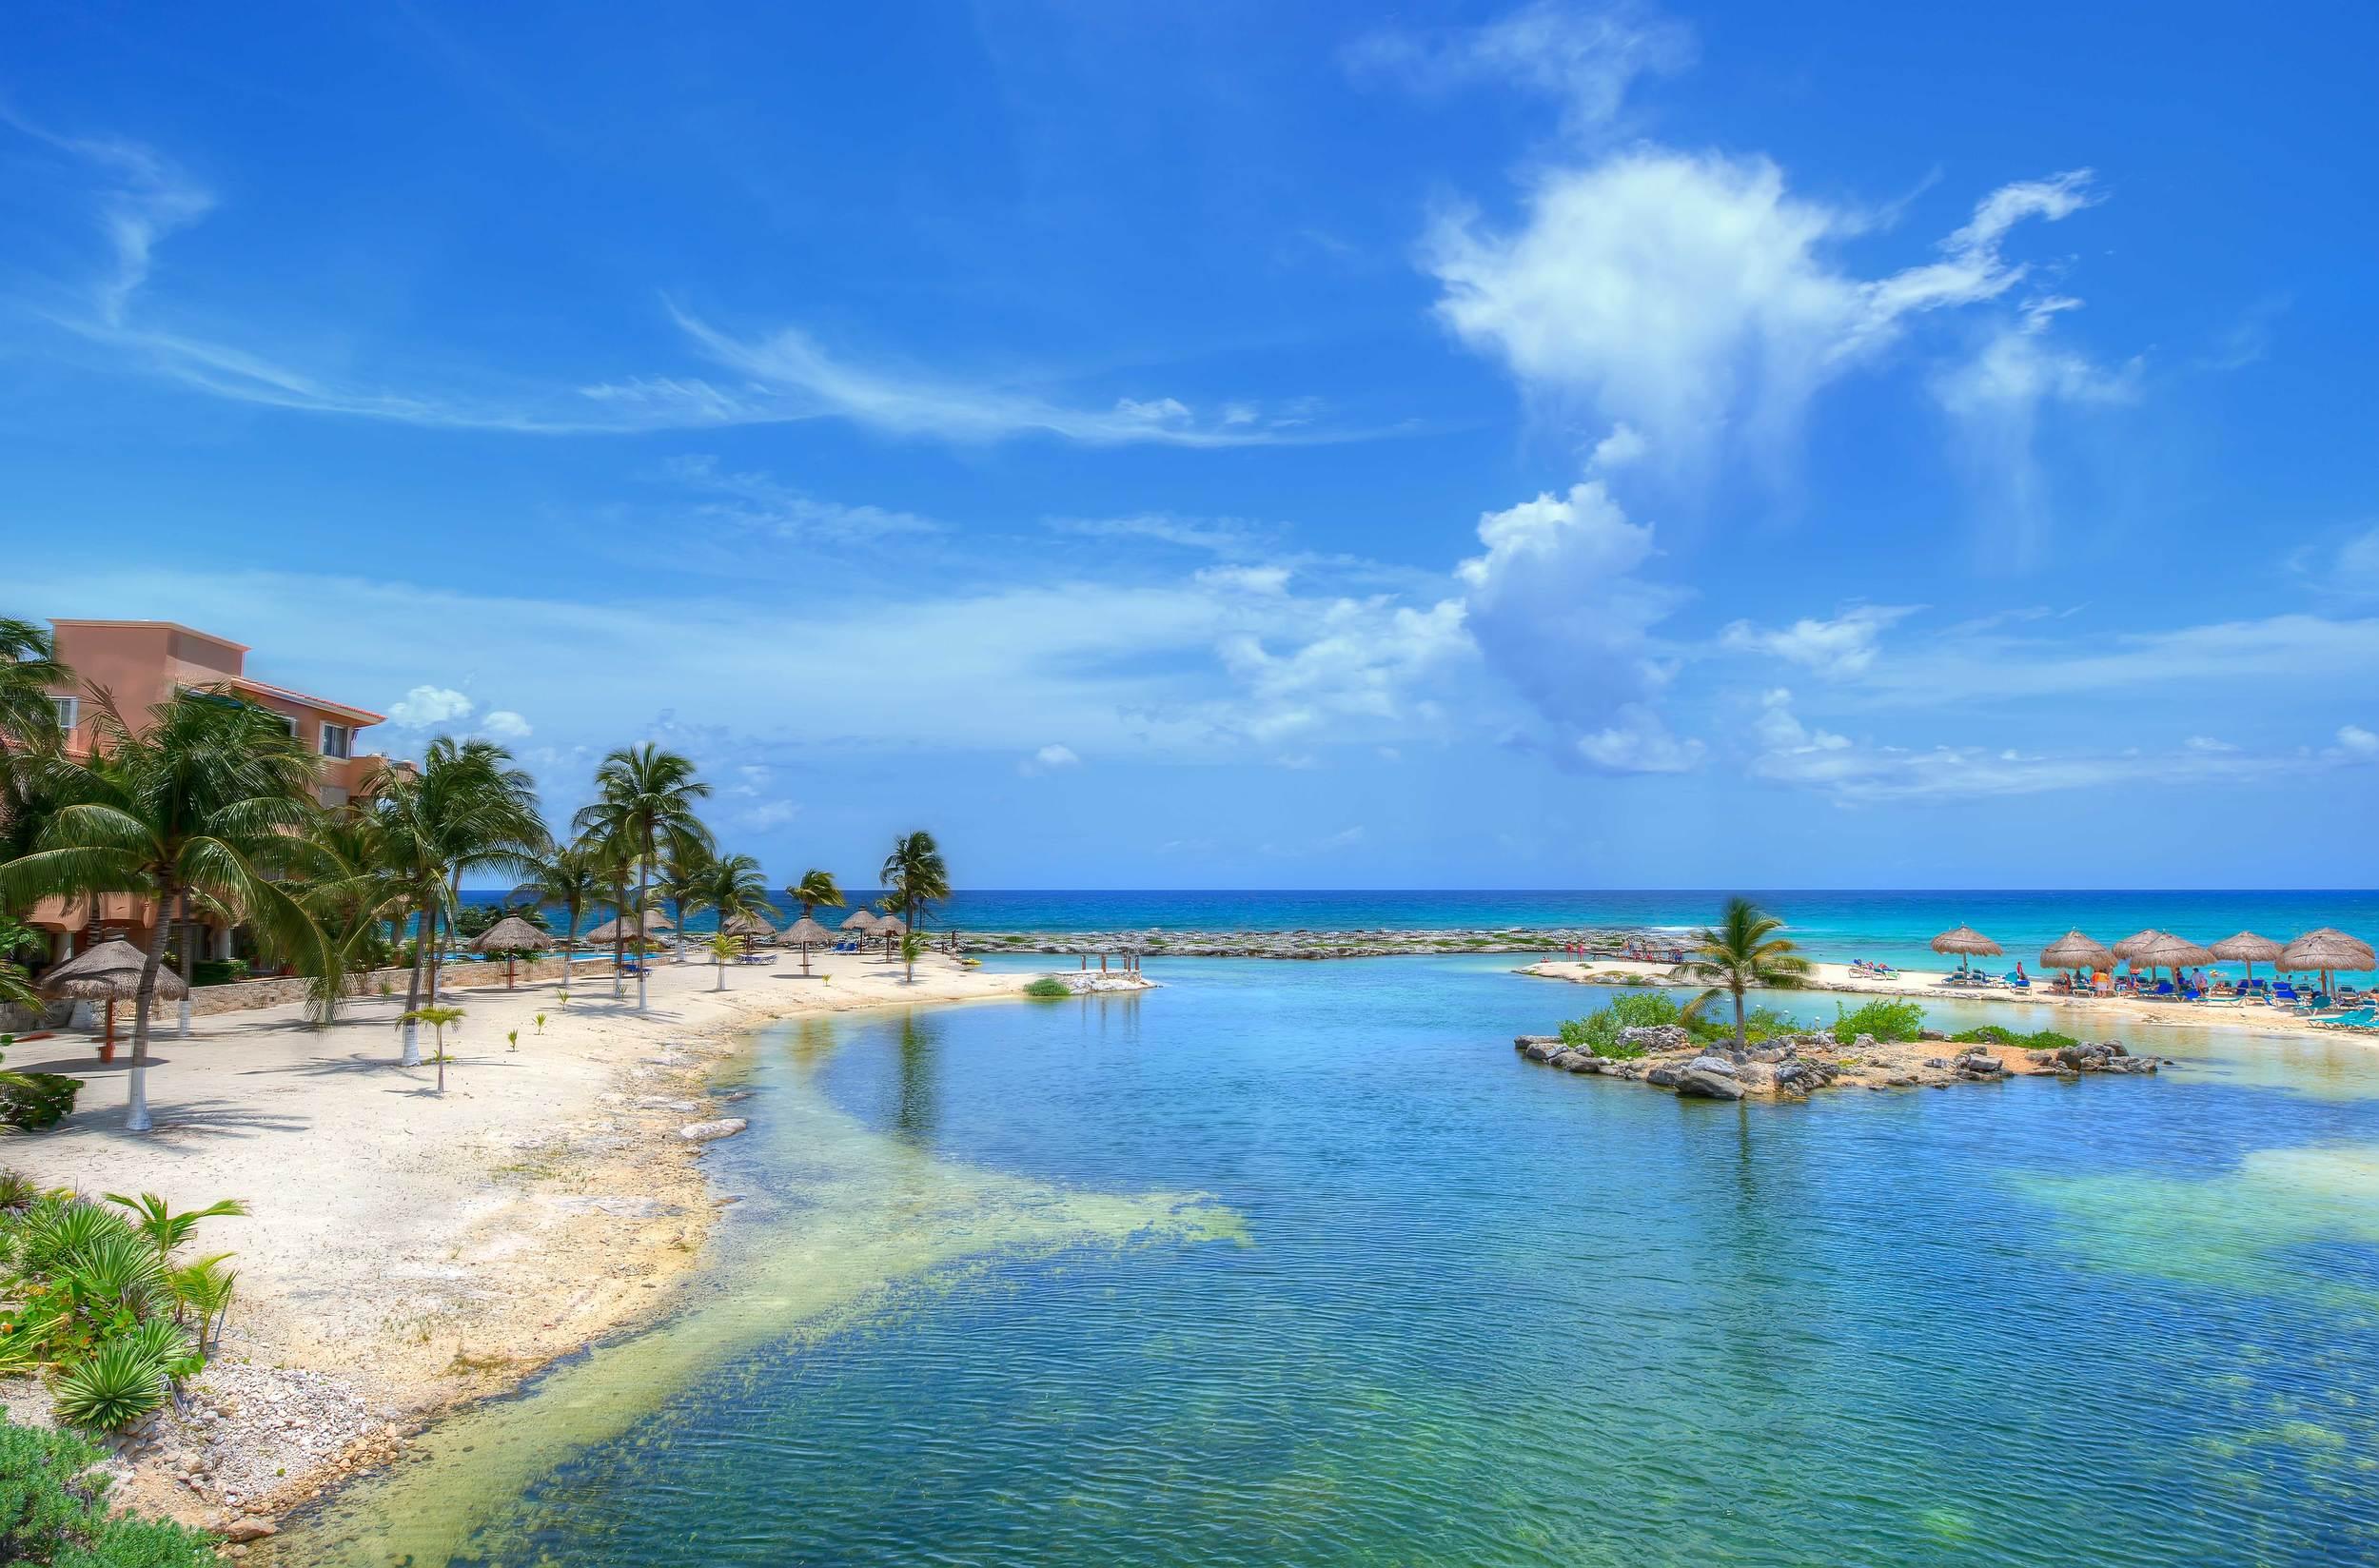 Lagoon at a resort near Puerto Aventuras Mexico